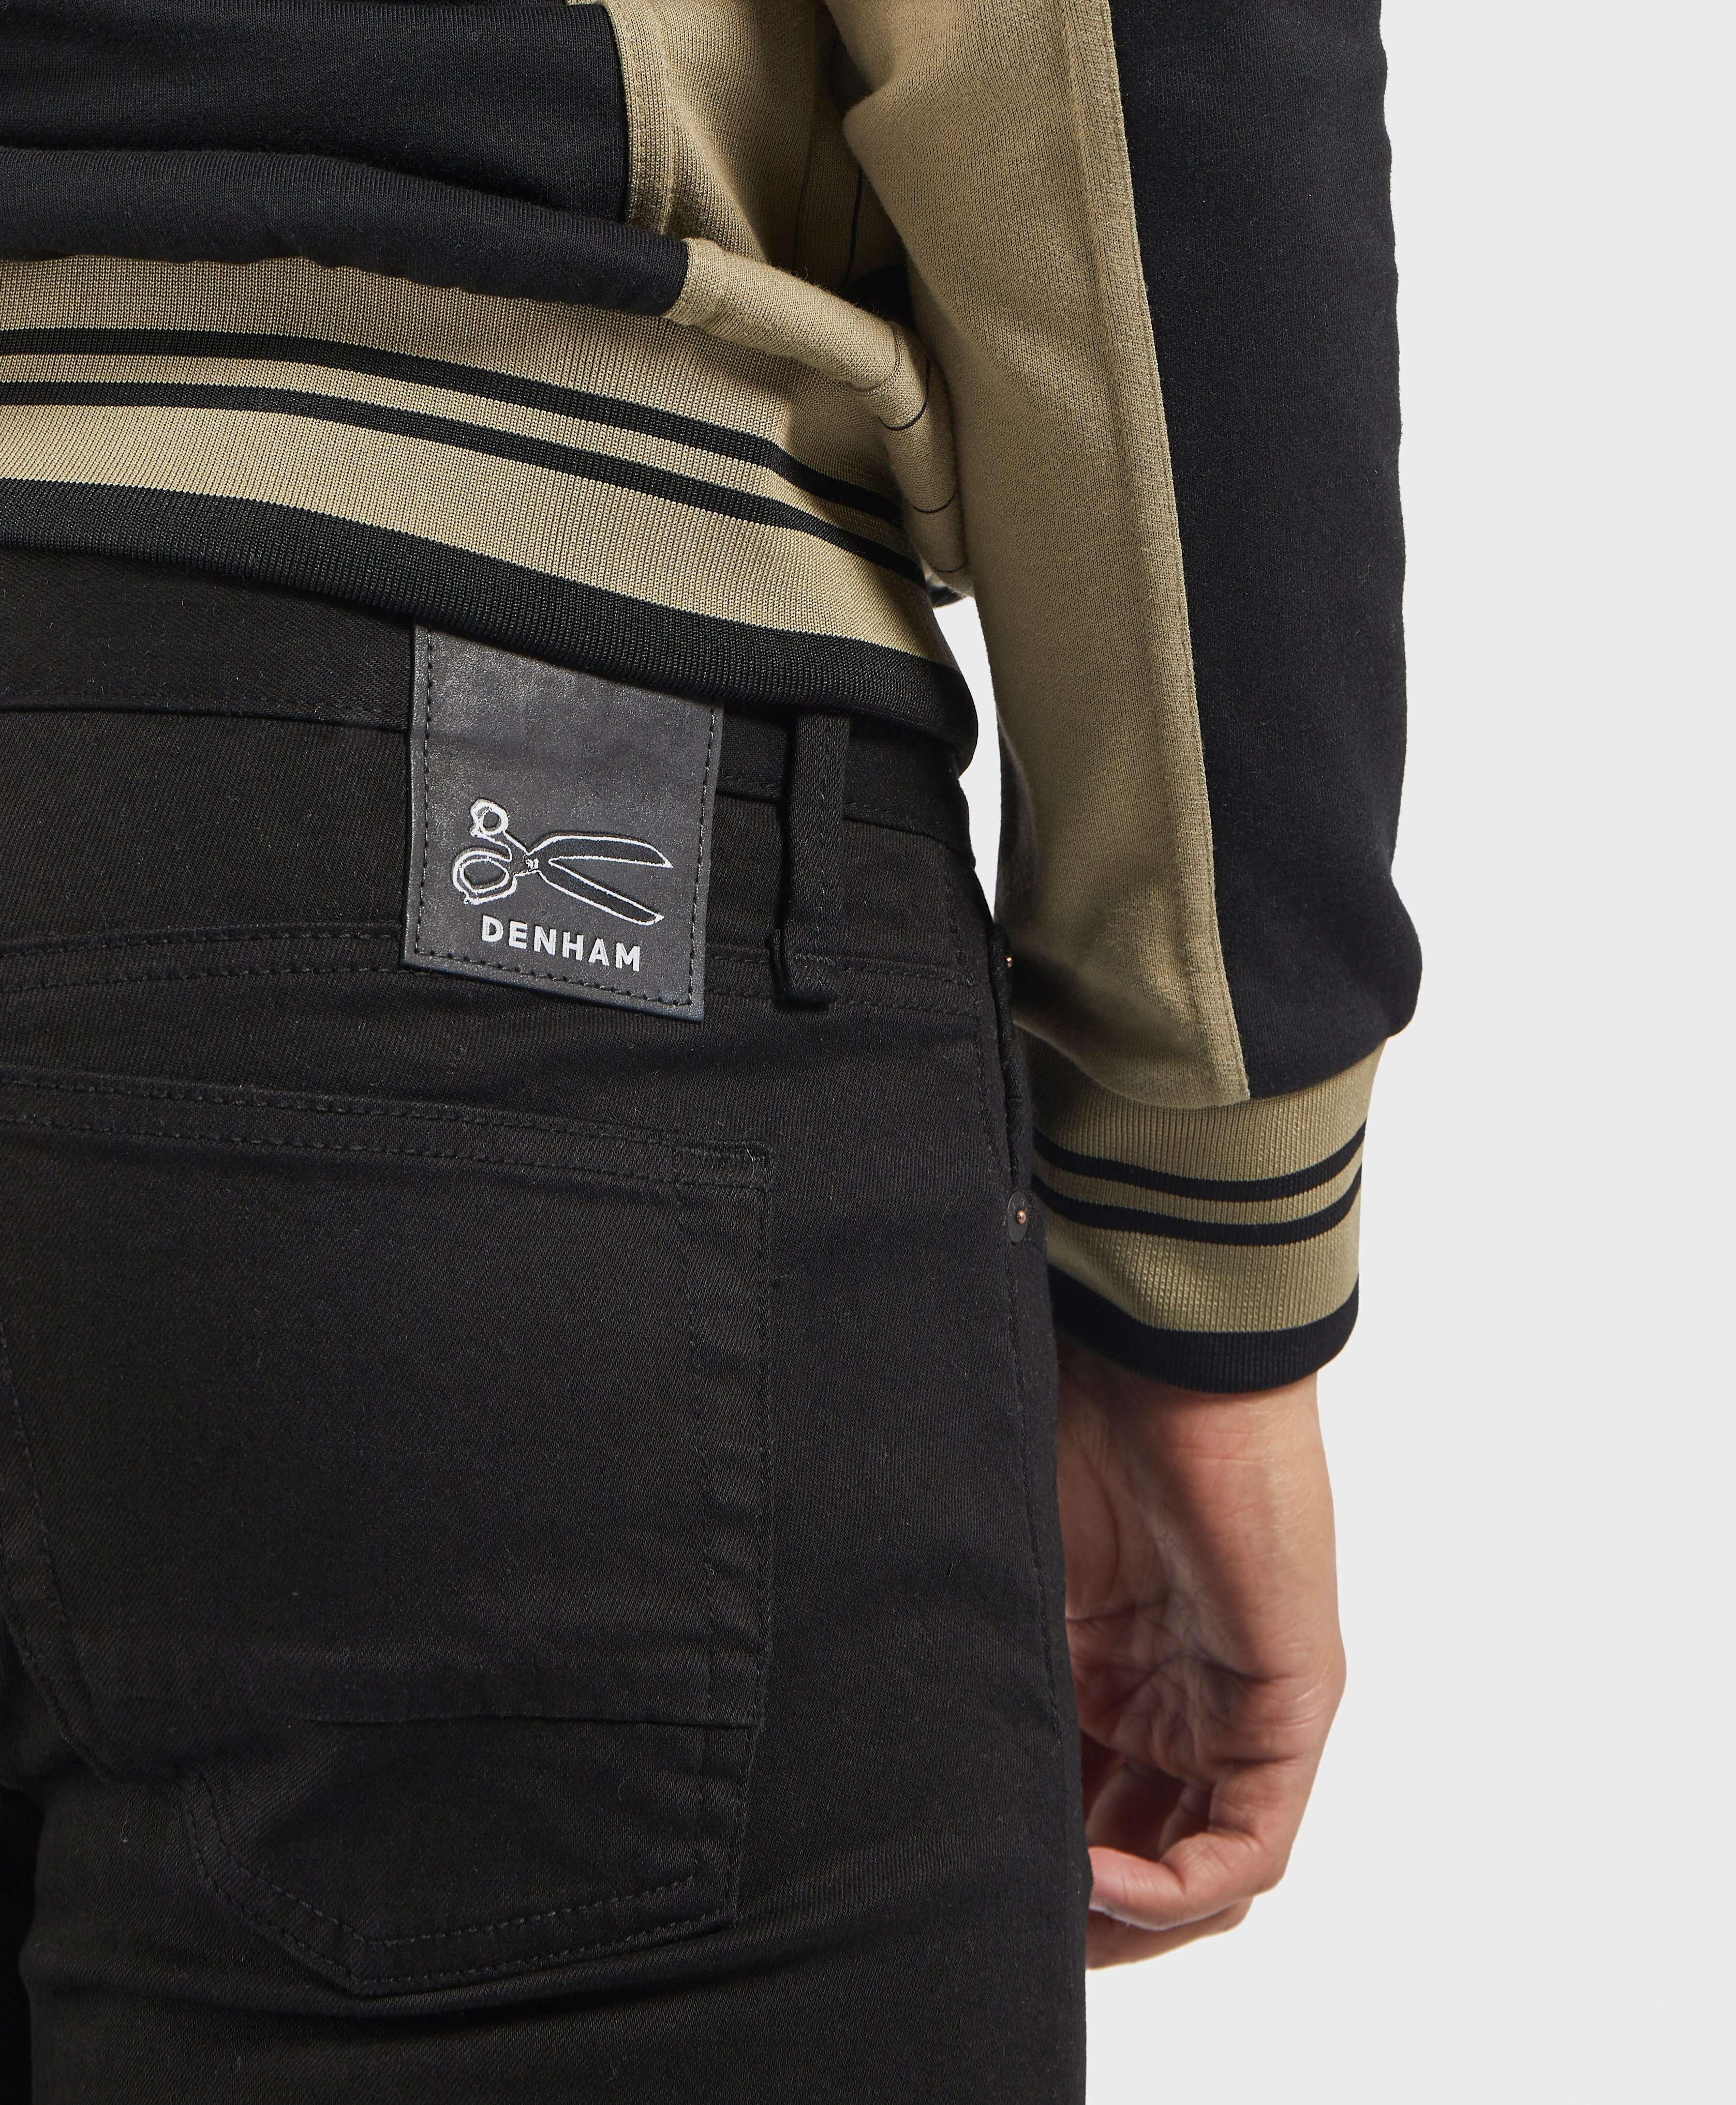 Denham Bolt Skinny Jeans